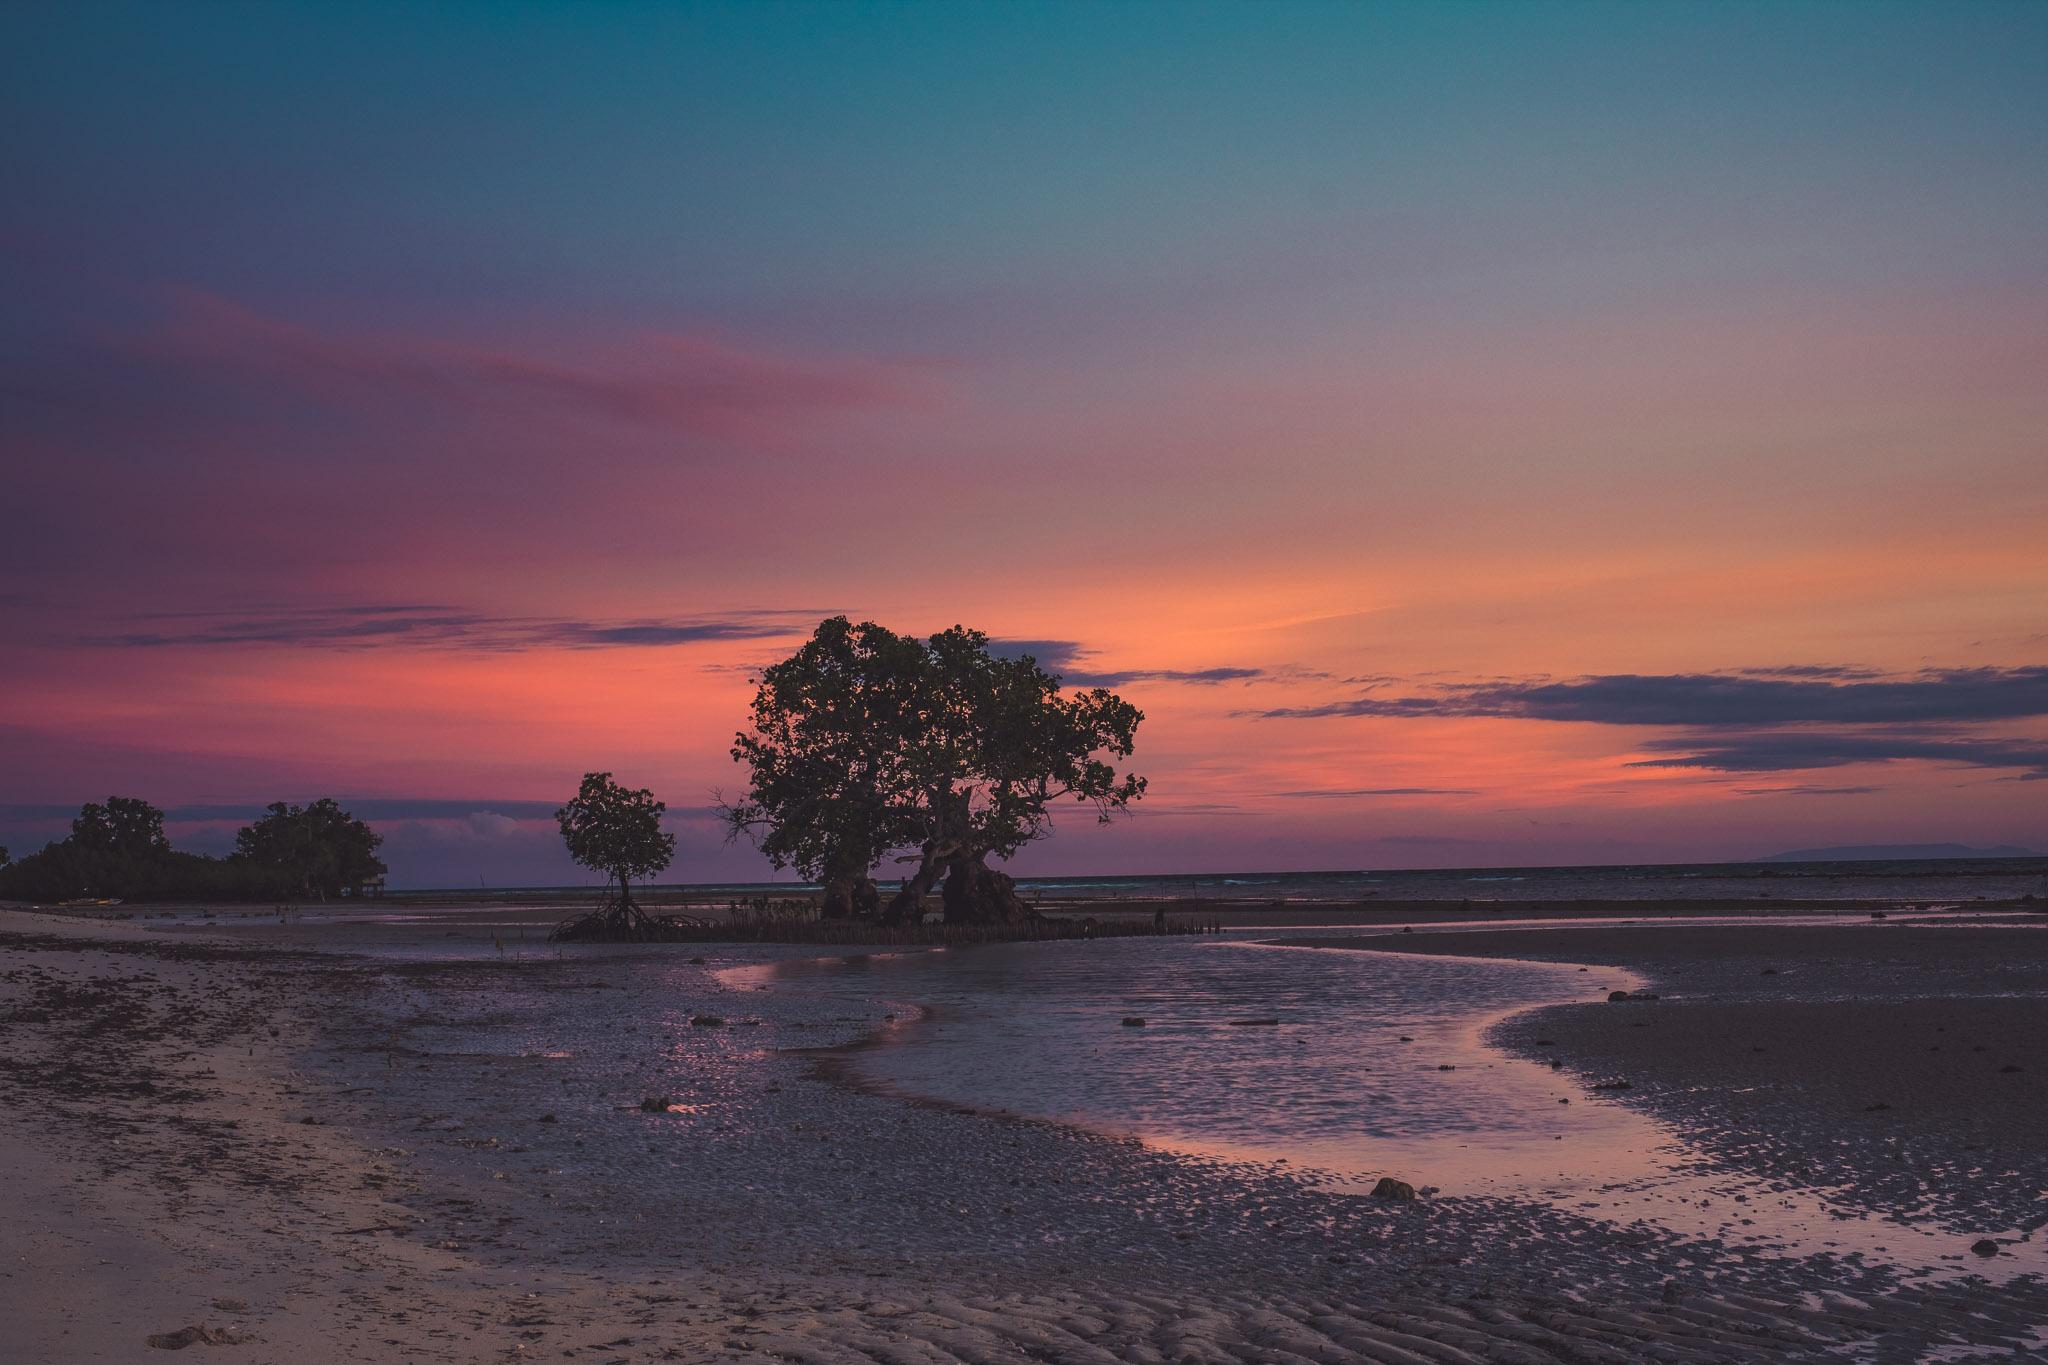 Talingtin Sunrise with Mangrove Tree